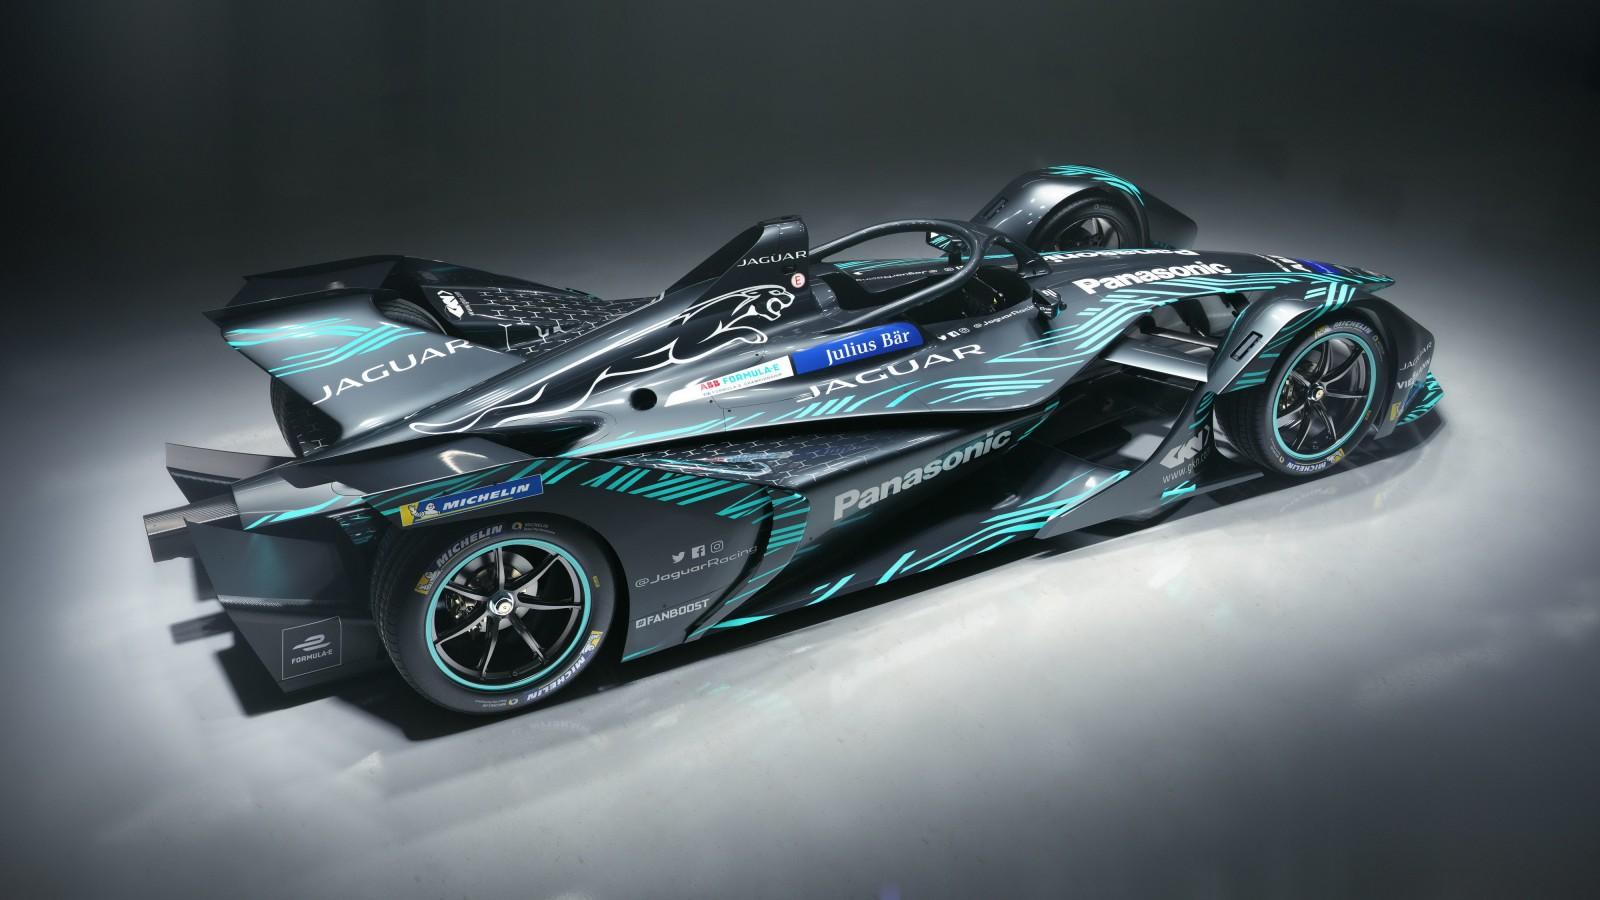 2018 Jaguar I Type Electric Formula E Car 4K 2 Wallpaper ...